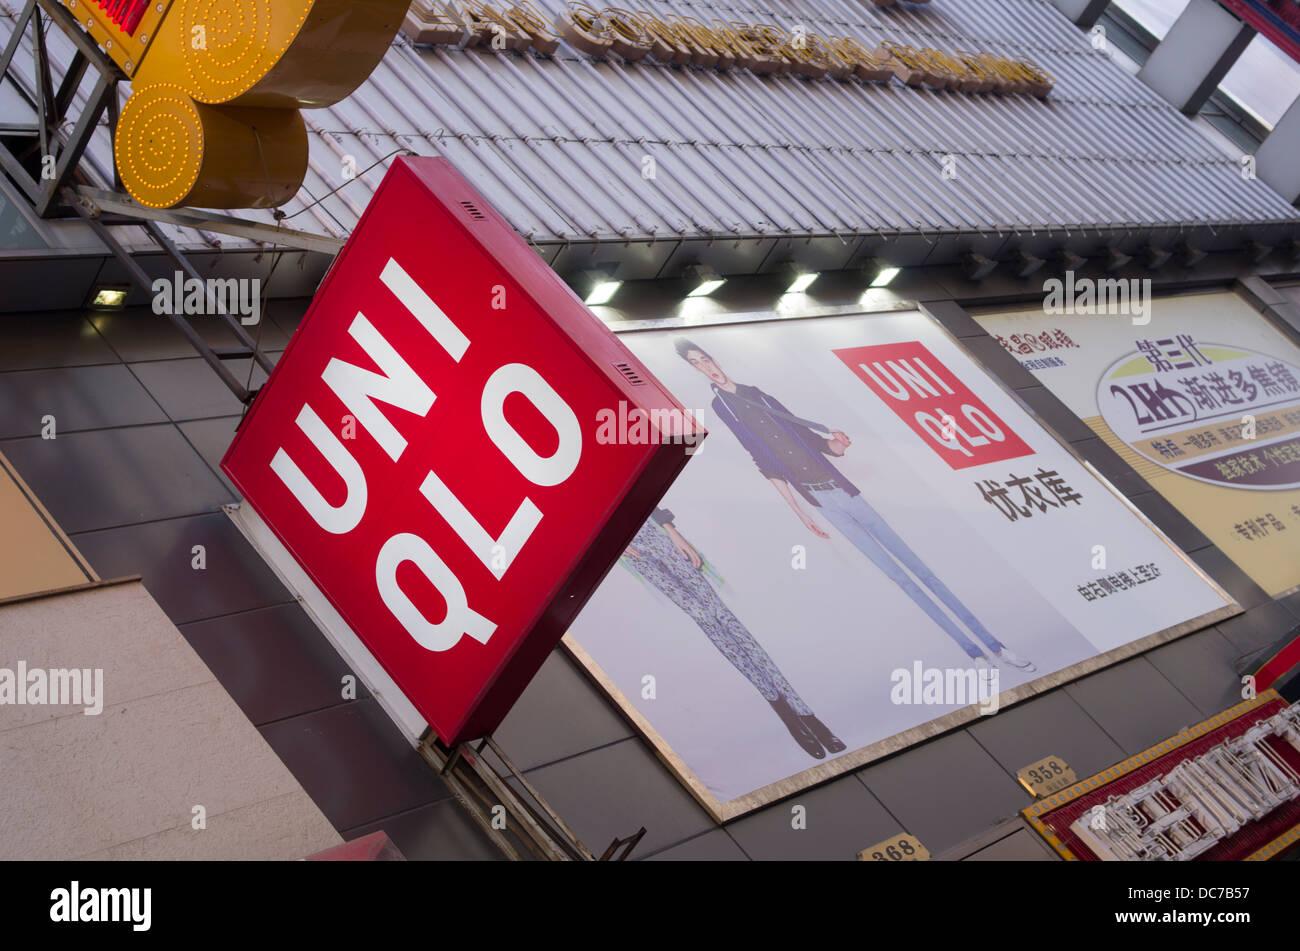 uniqlo japanese fashion clothing brand store in shanghai china